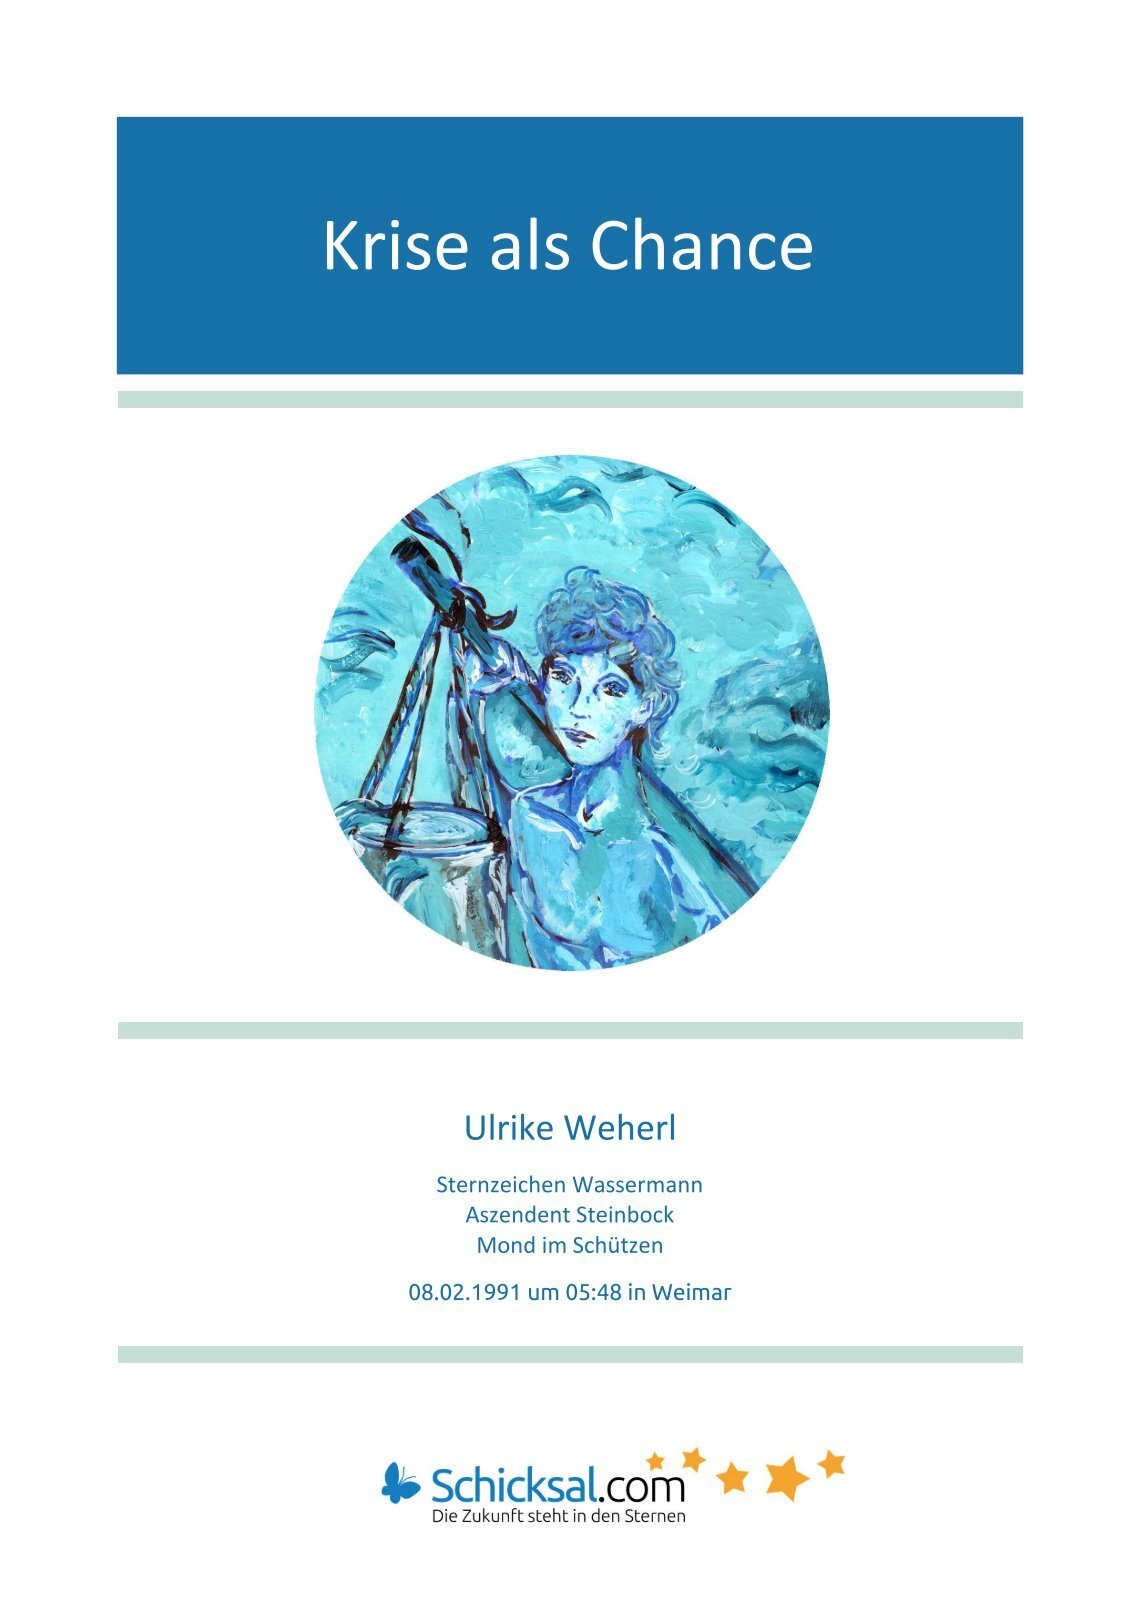 Horoskop Krise als Chance Ulrike